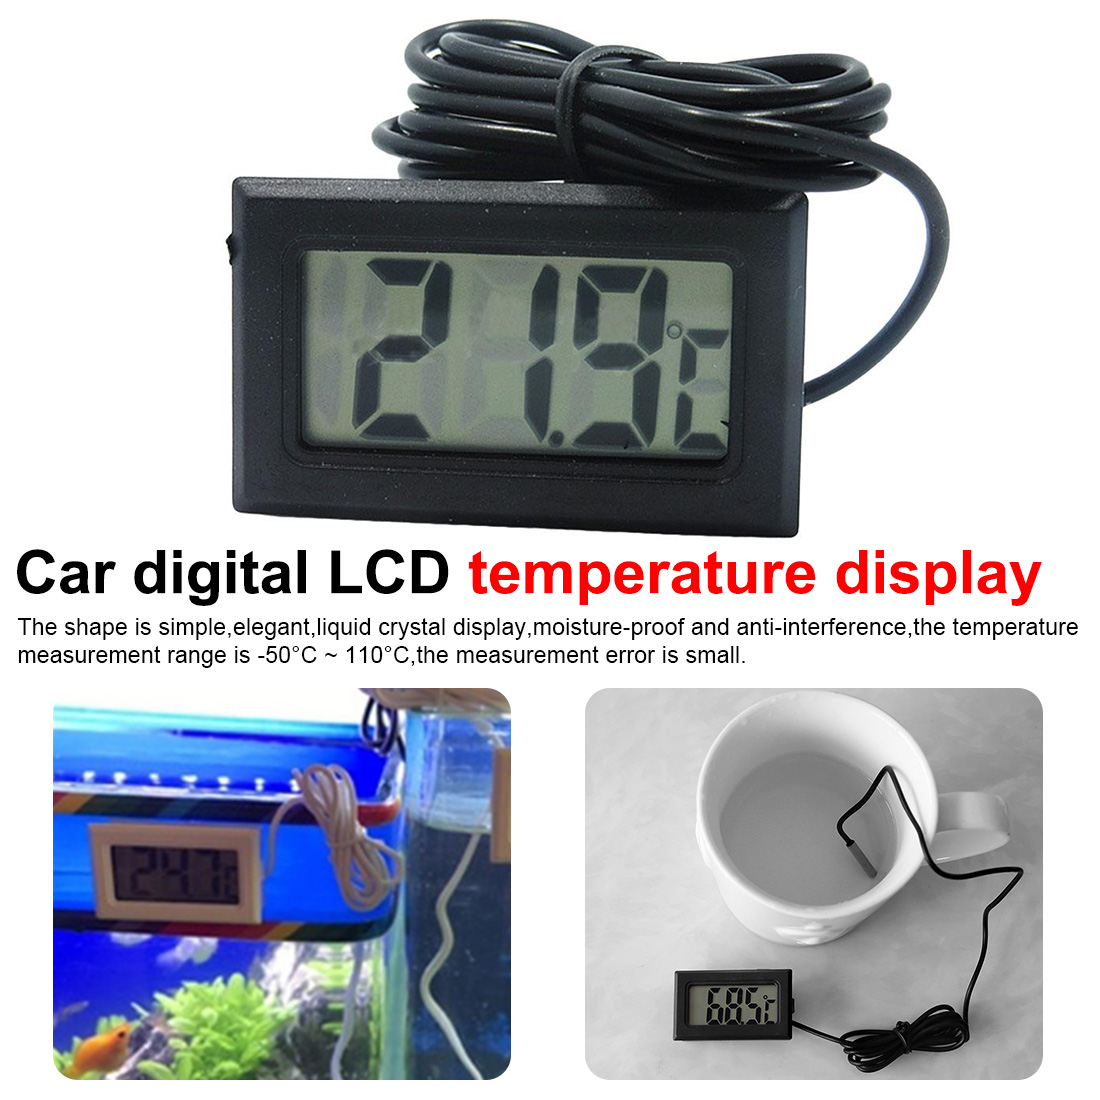 Auto Digital LCD Display Temperatur Sensor Auto Ornamente Zubehör Innen Temperatur Meter Werkzeuge-50-110 ℃